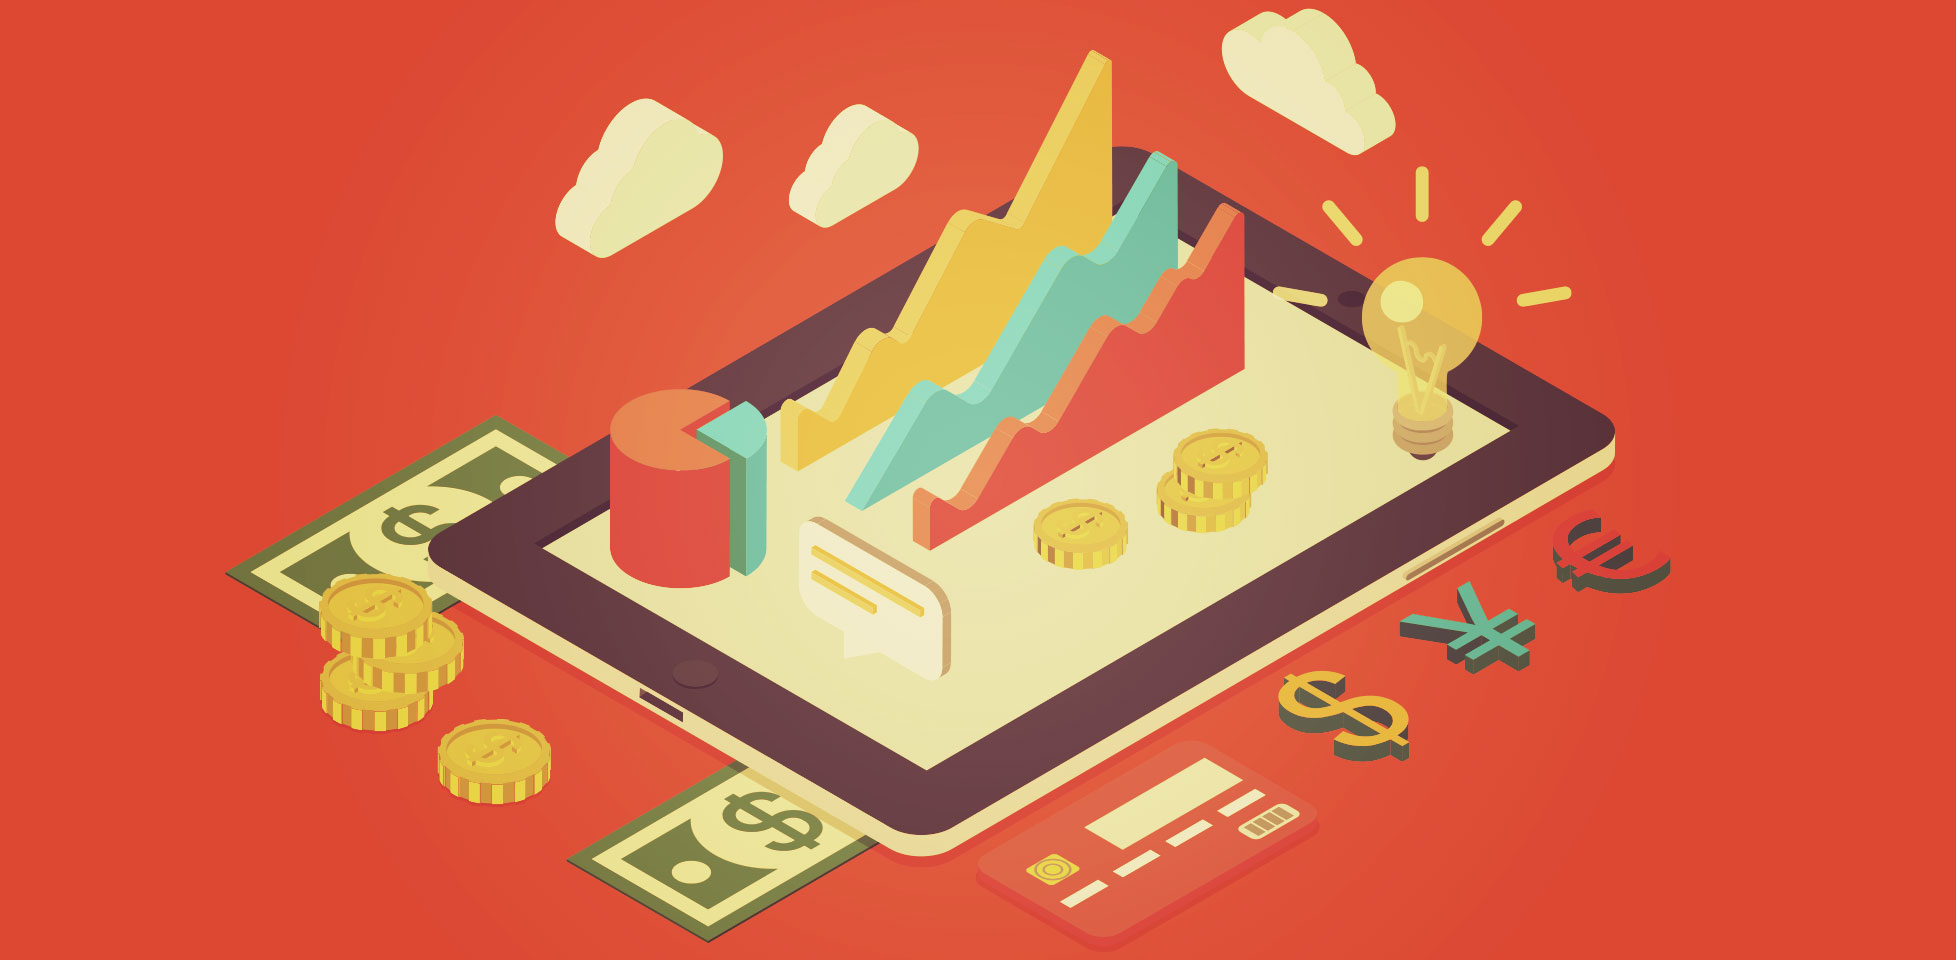 Does responsive web design make you more money?